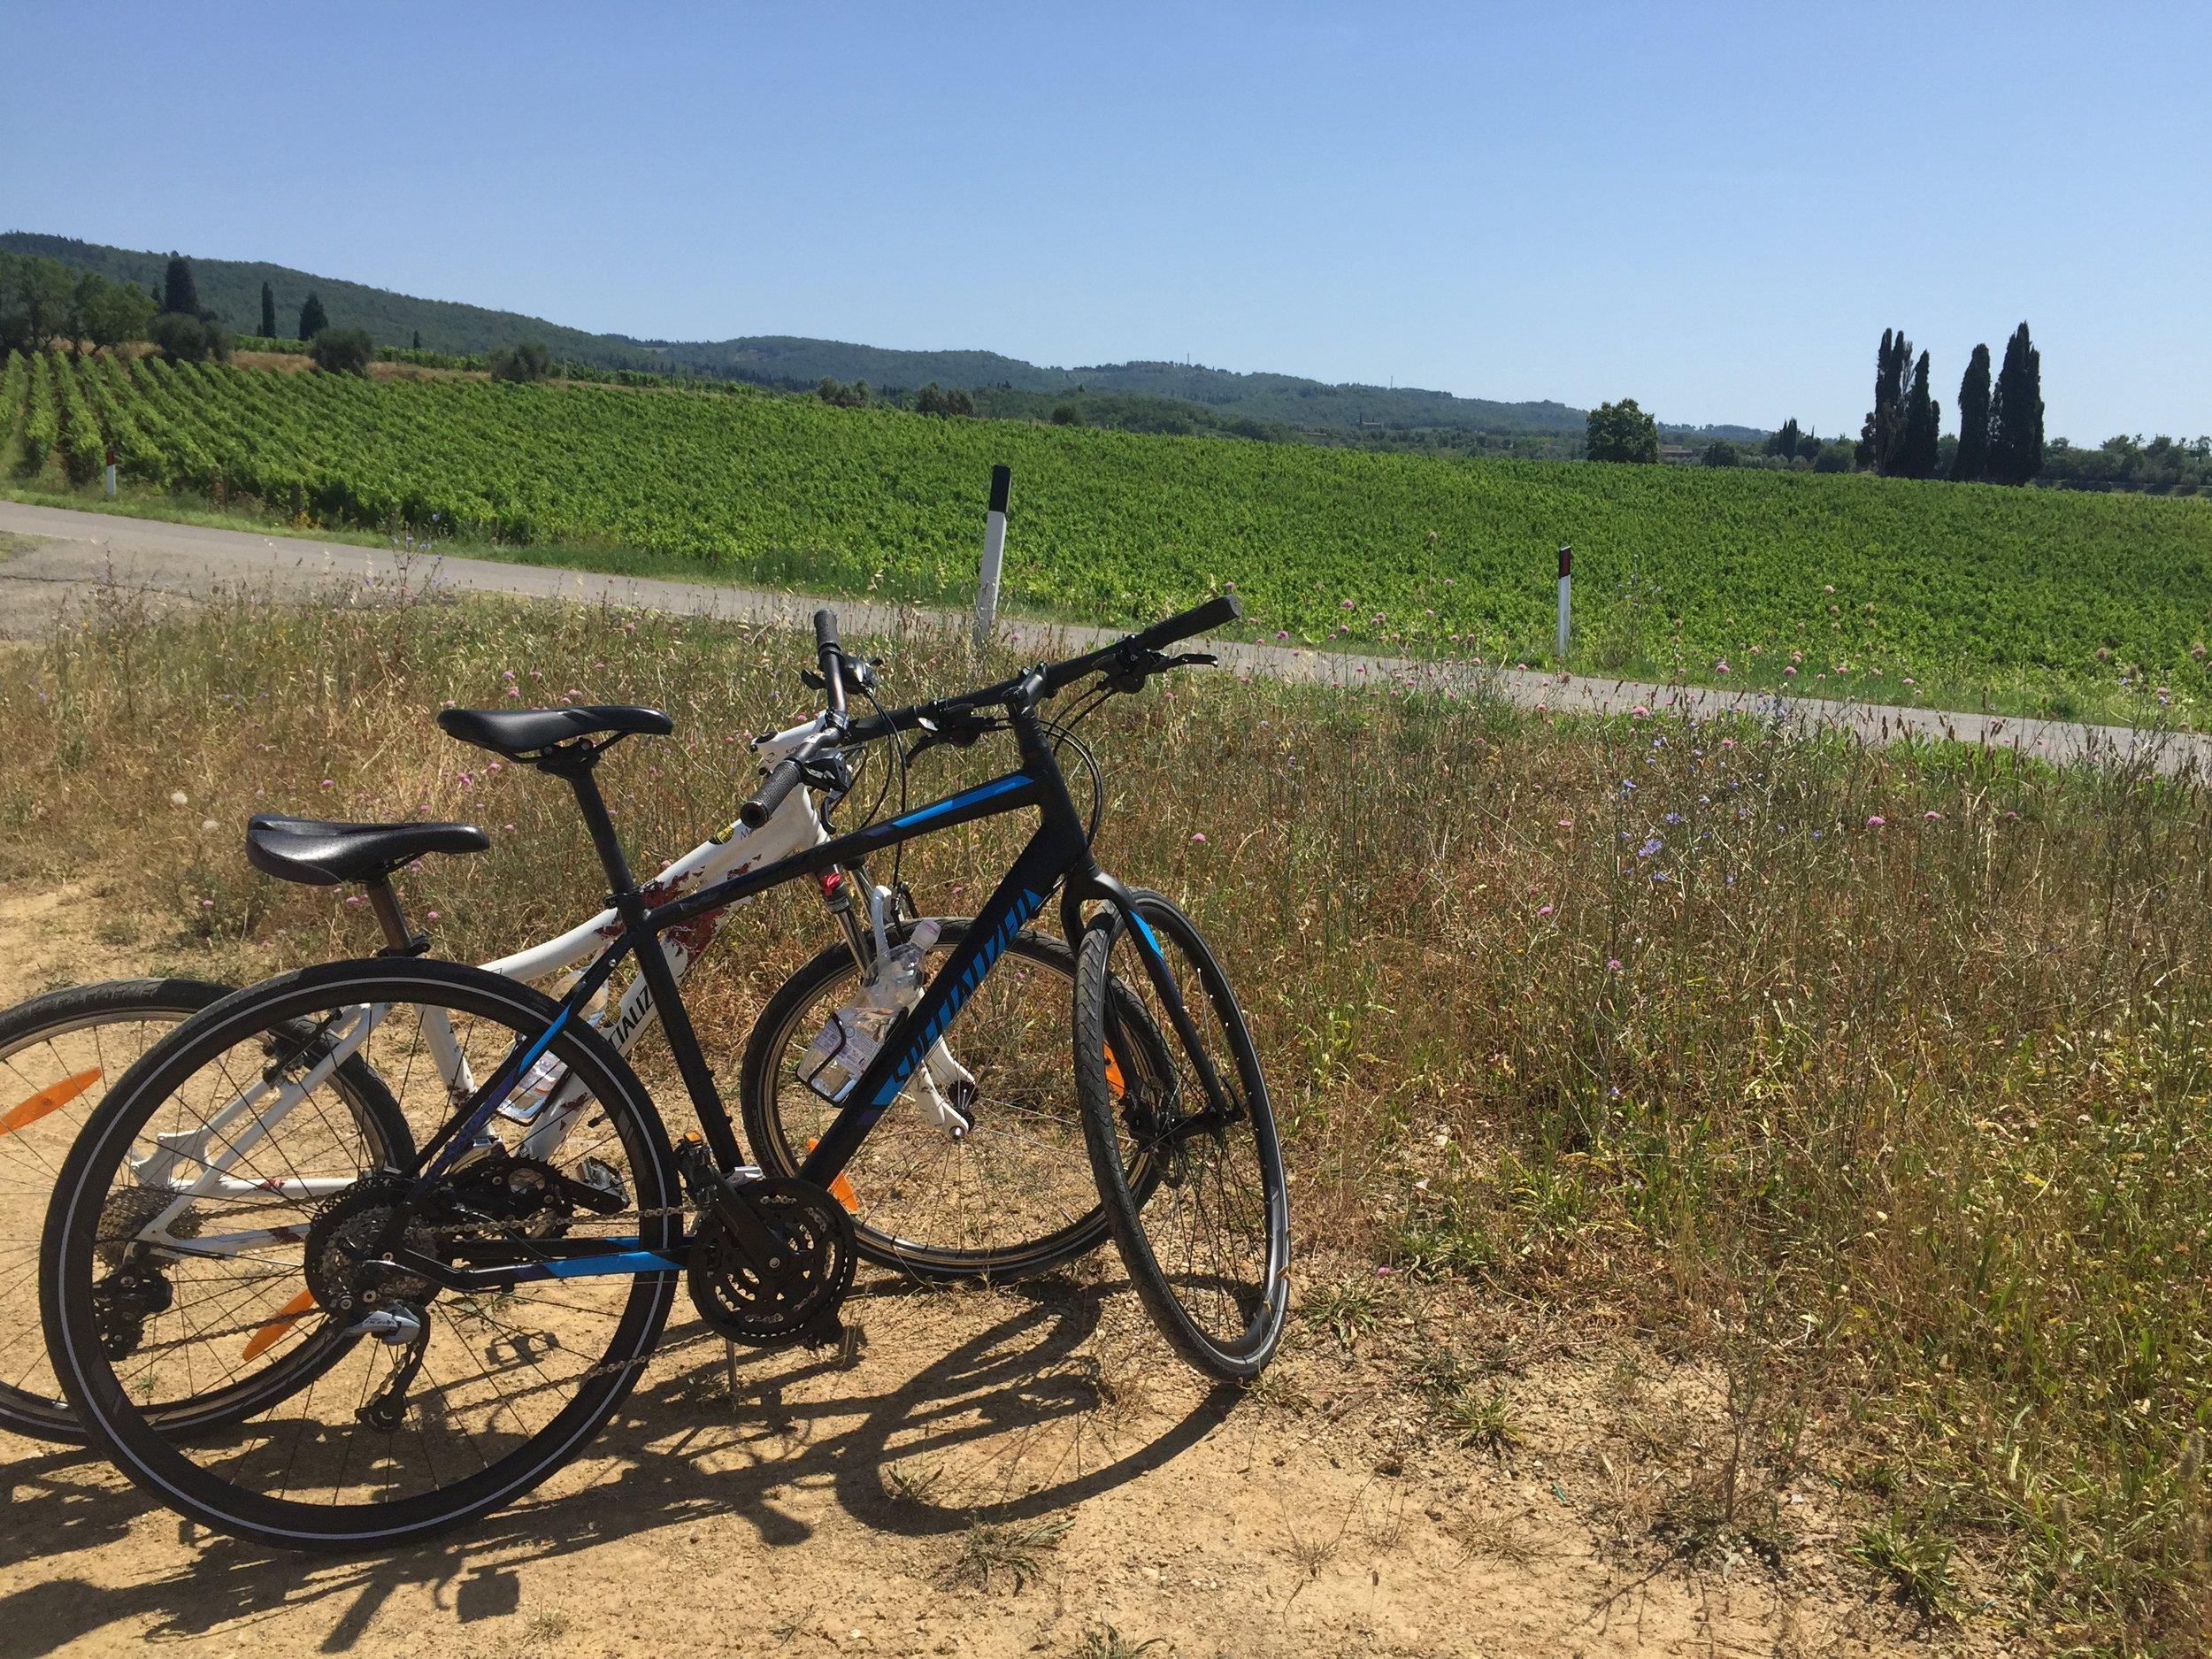 Biking in chianti